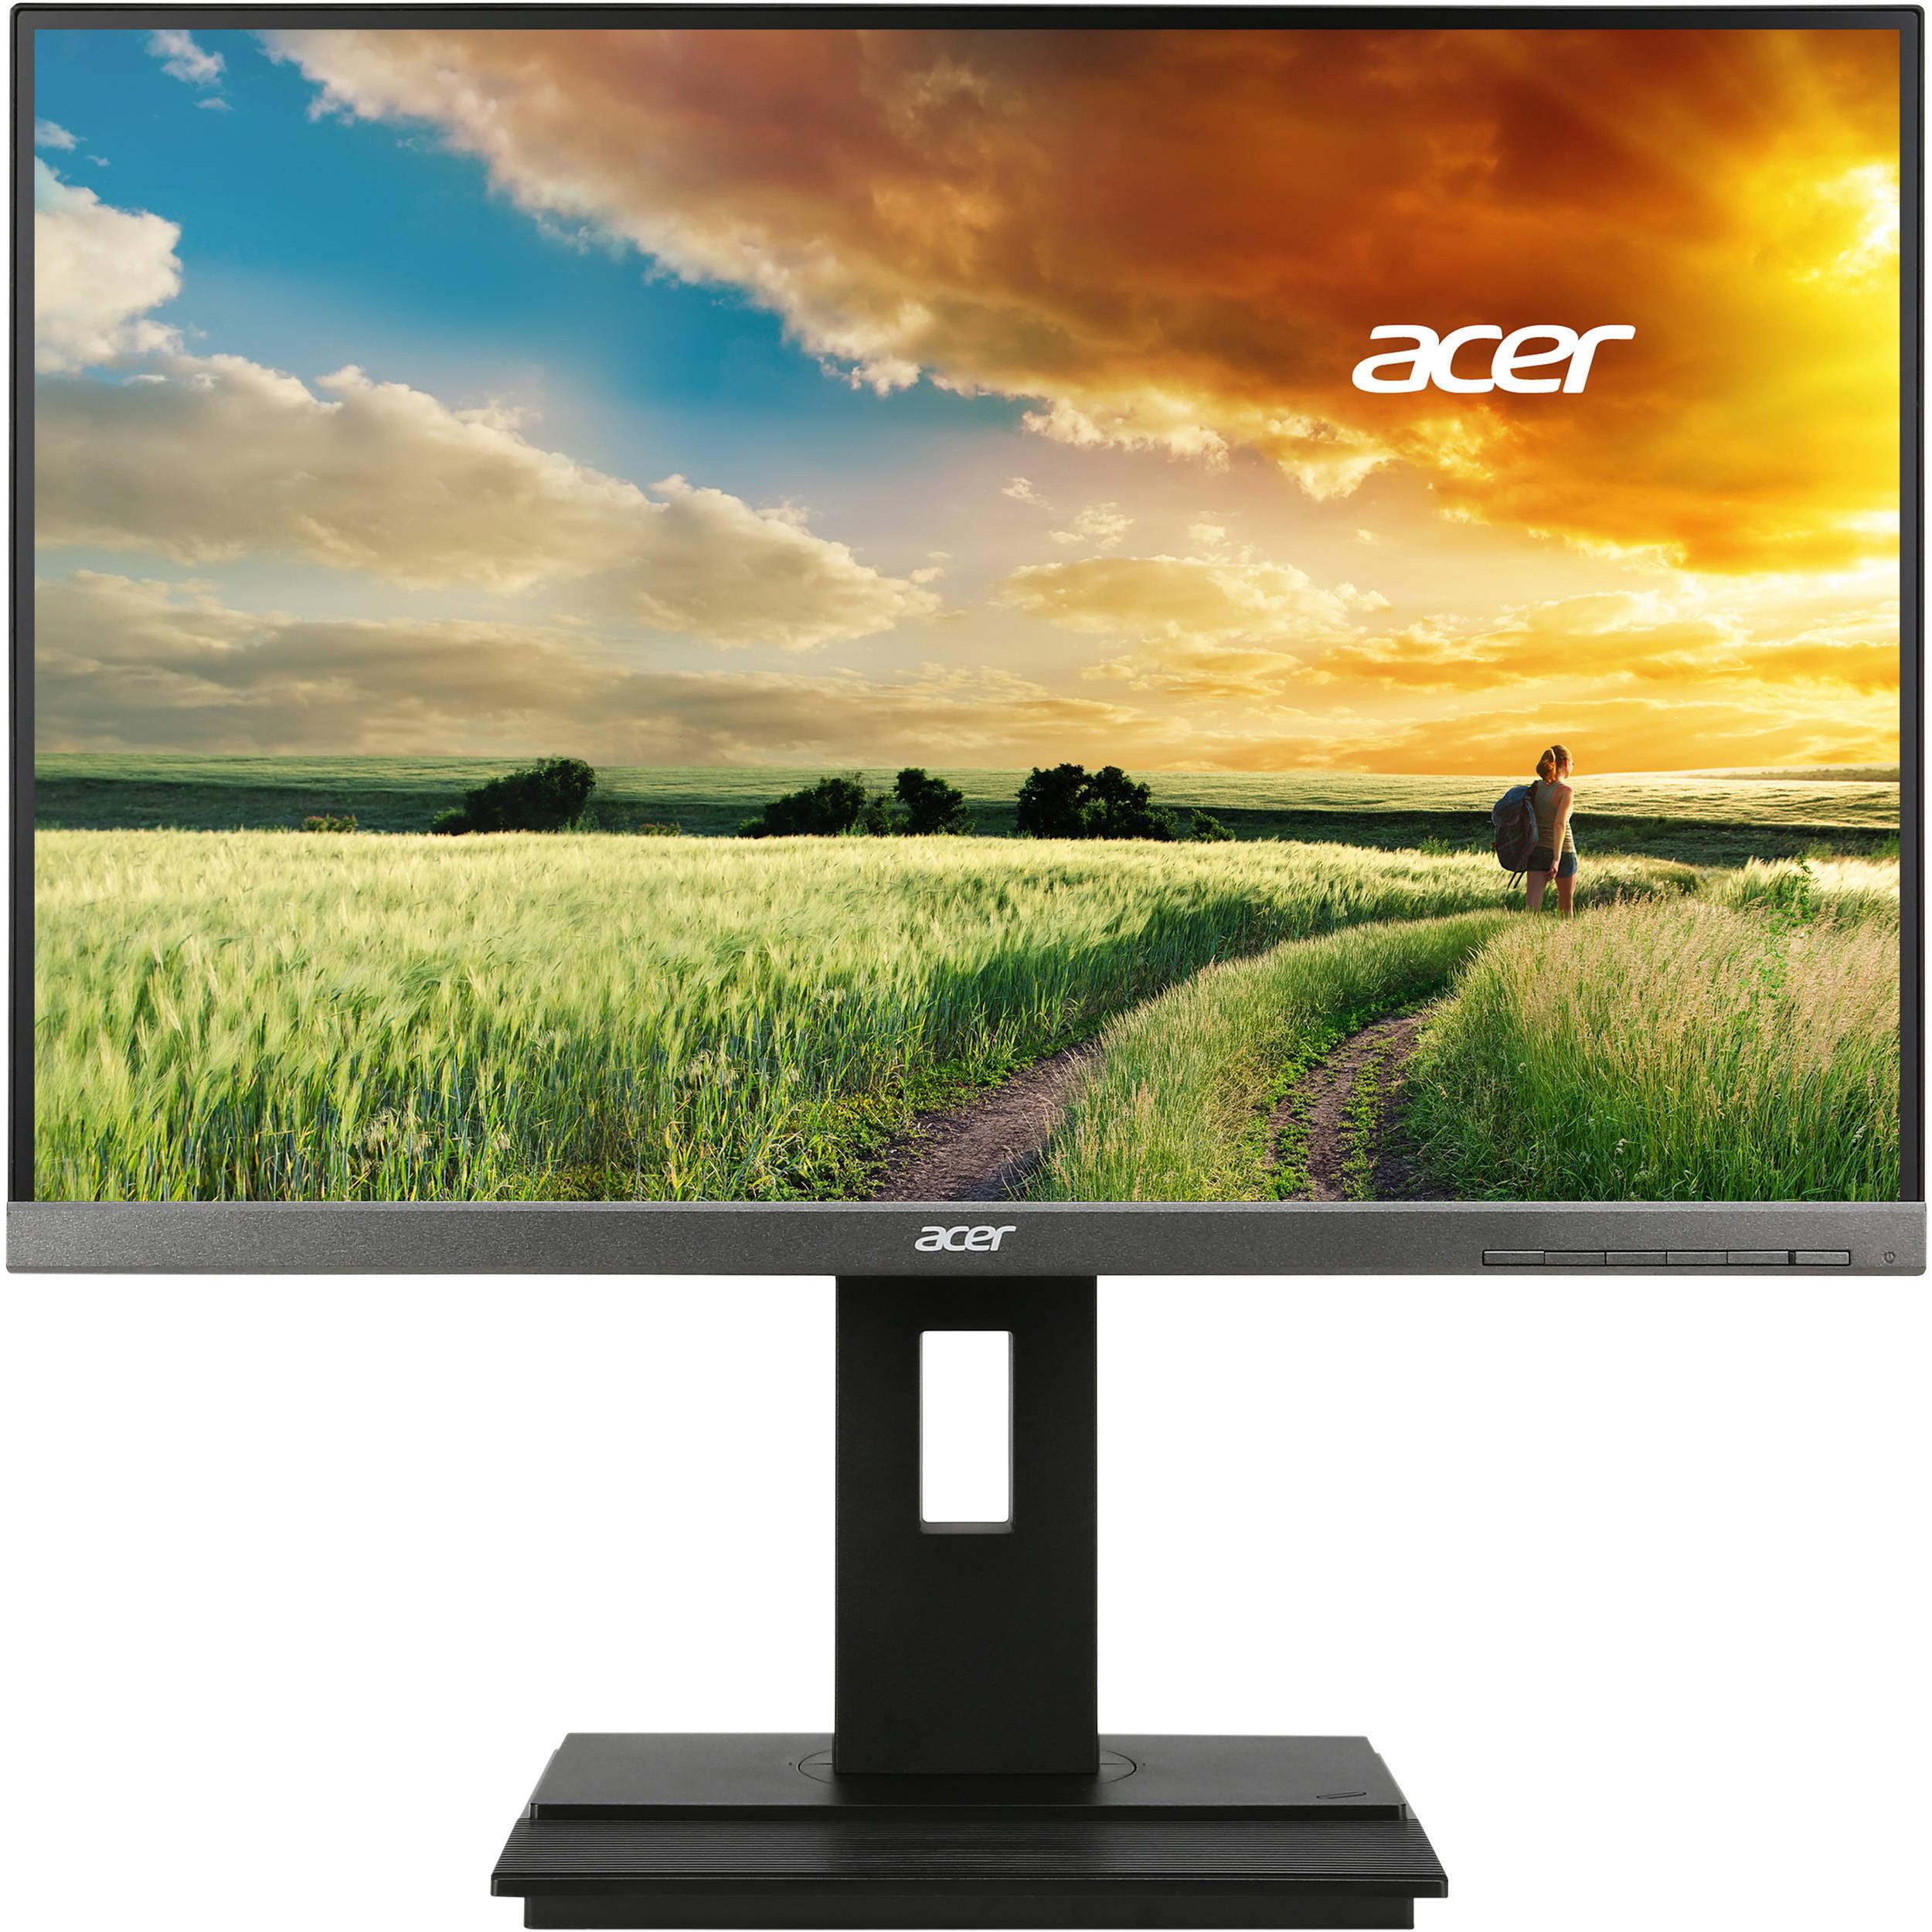 "Acer B6 24"" Widescreen LCD Computer Monitor WUXGA (1920 x 1200) 60 Hz 5 ms GTG | Manufacturer Refurbished"